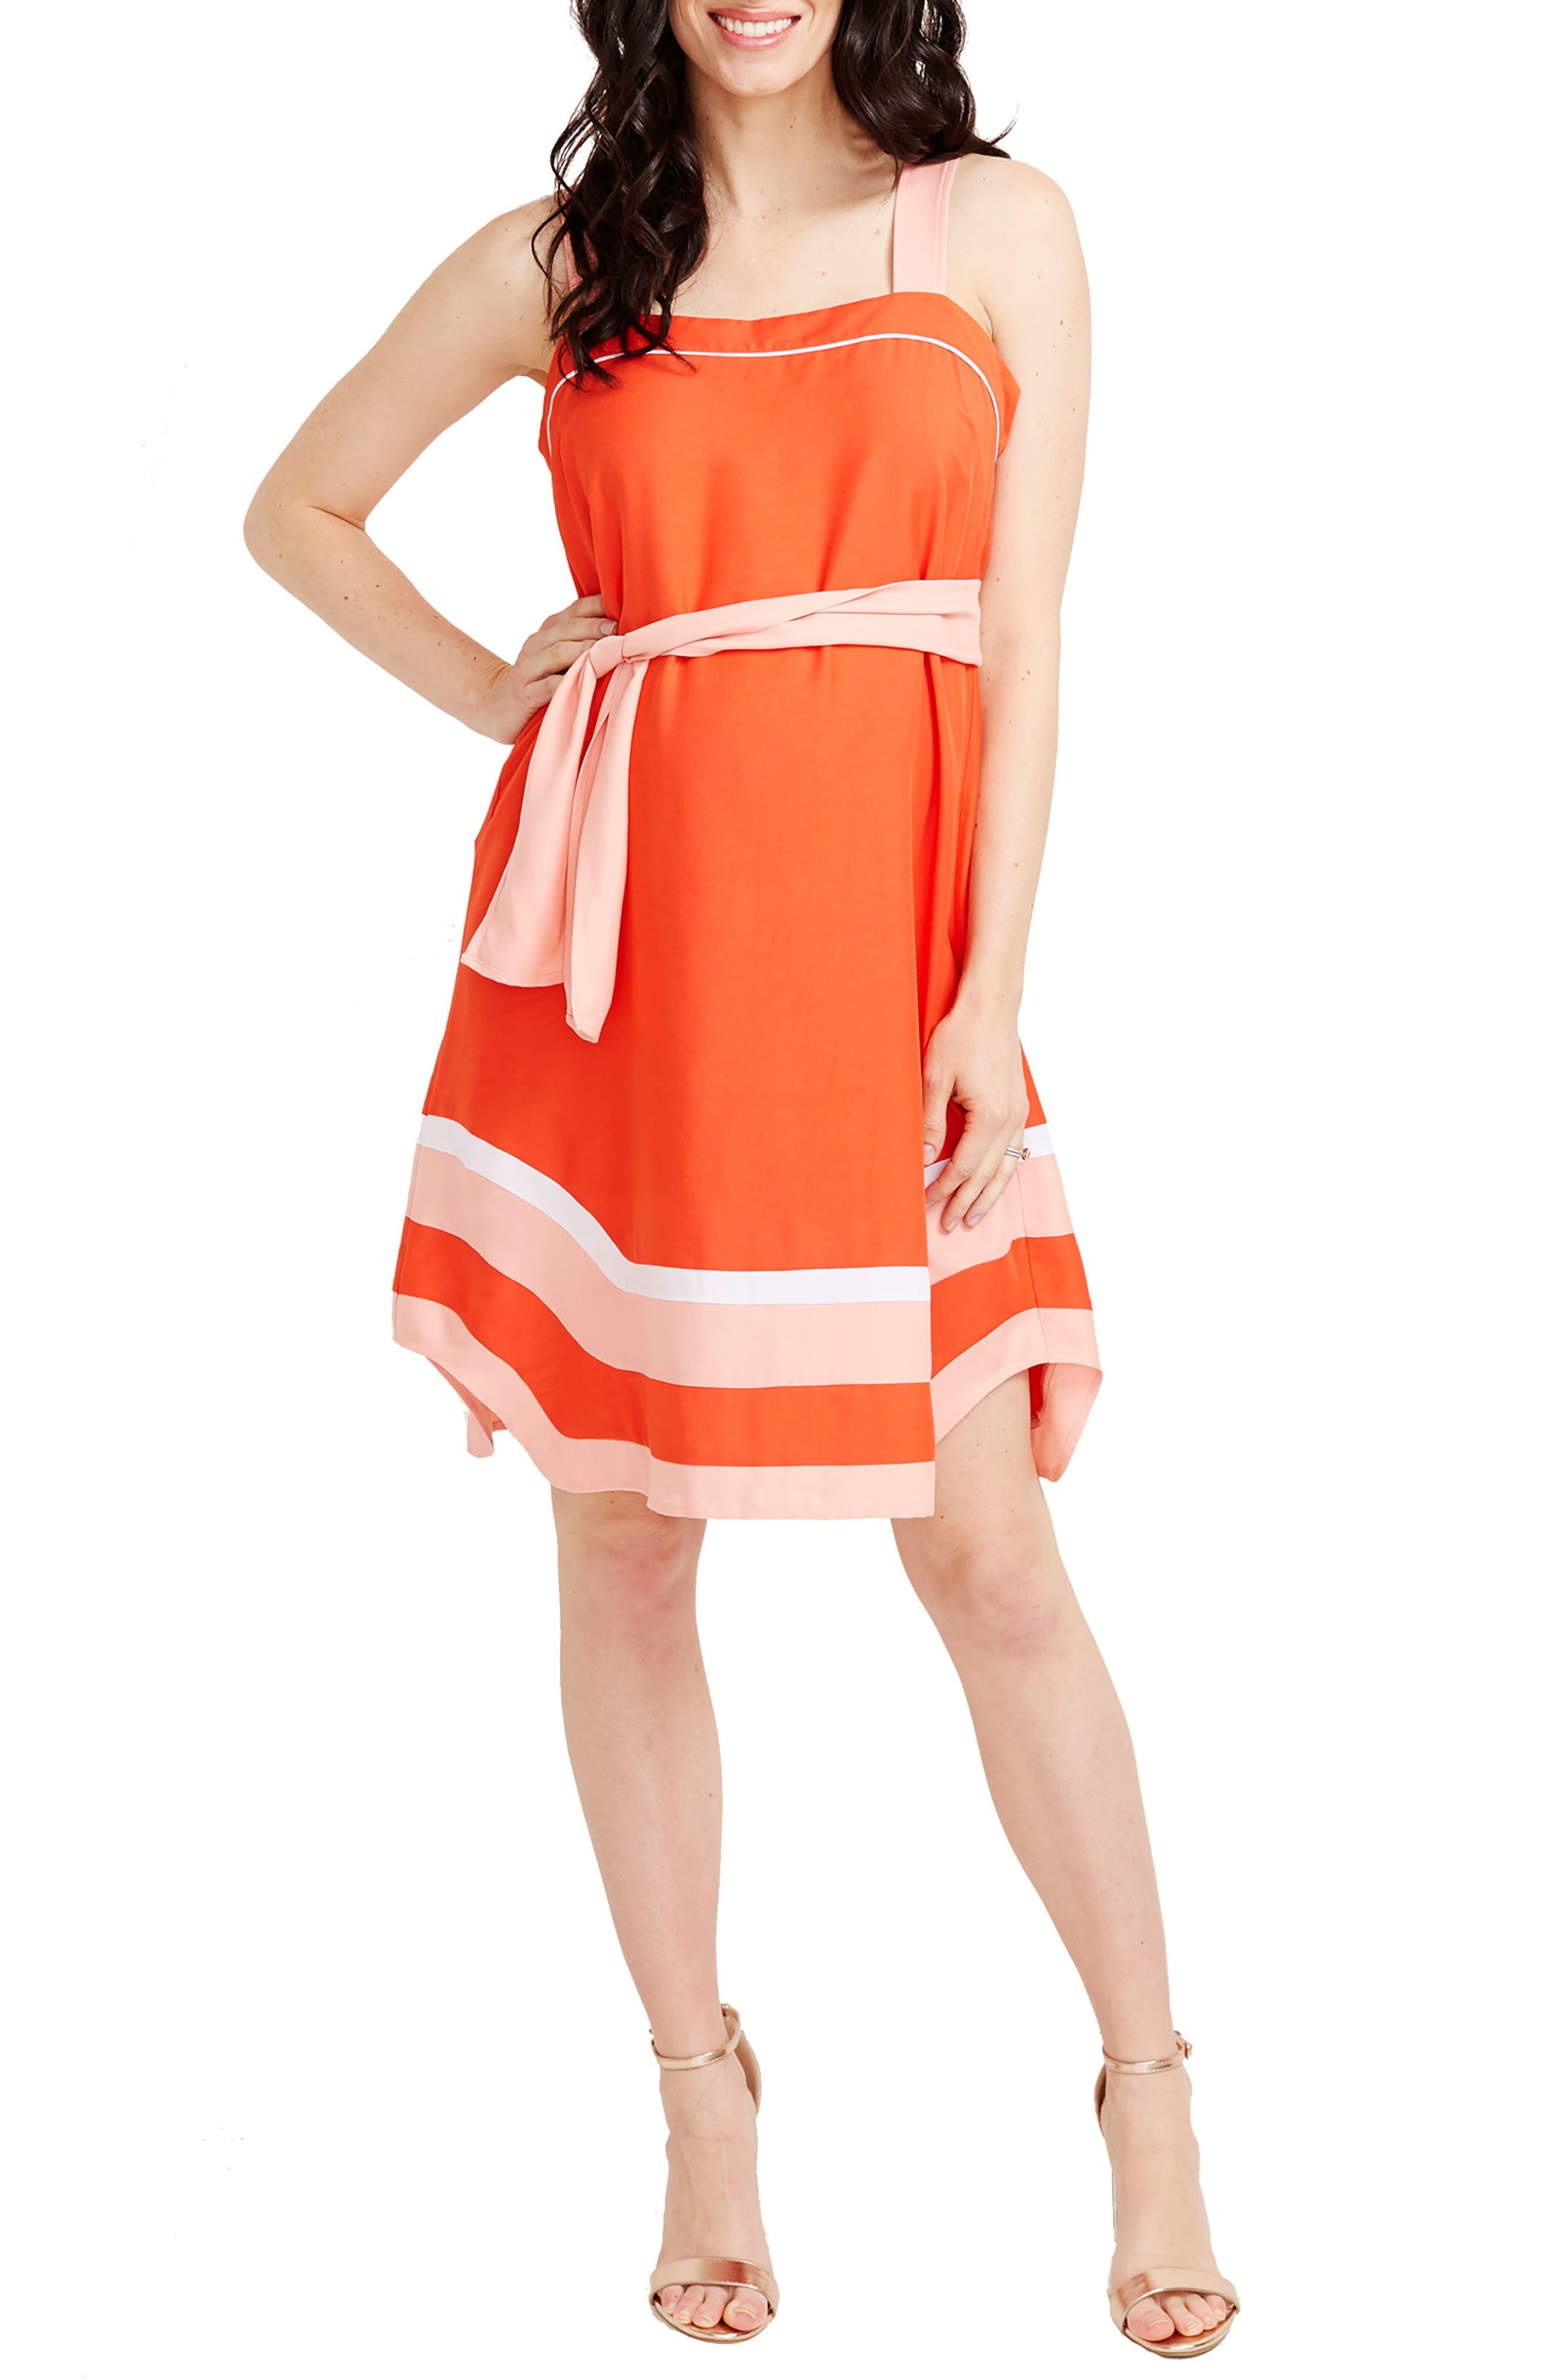 Rosie Pope Delfina Maternity Dress